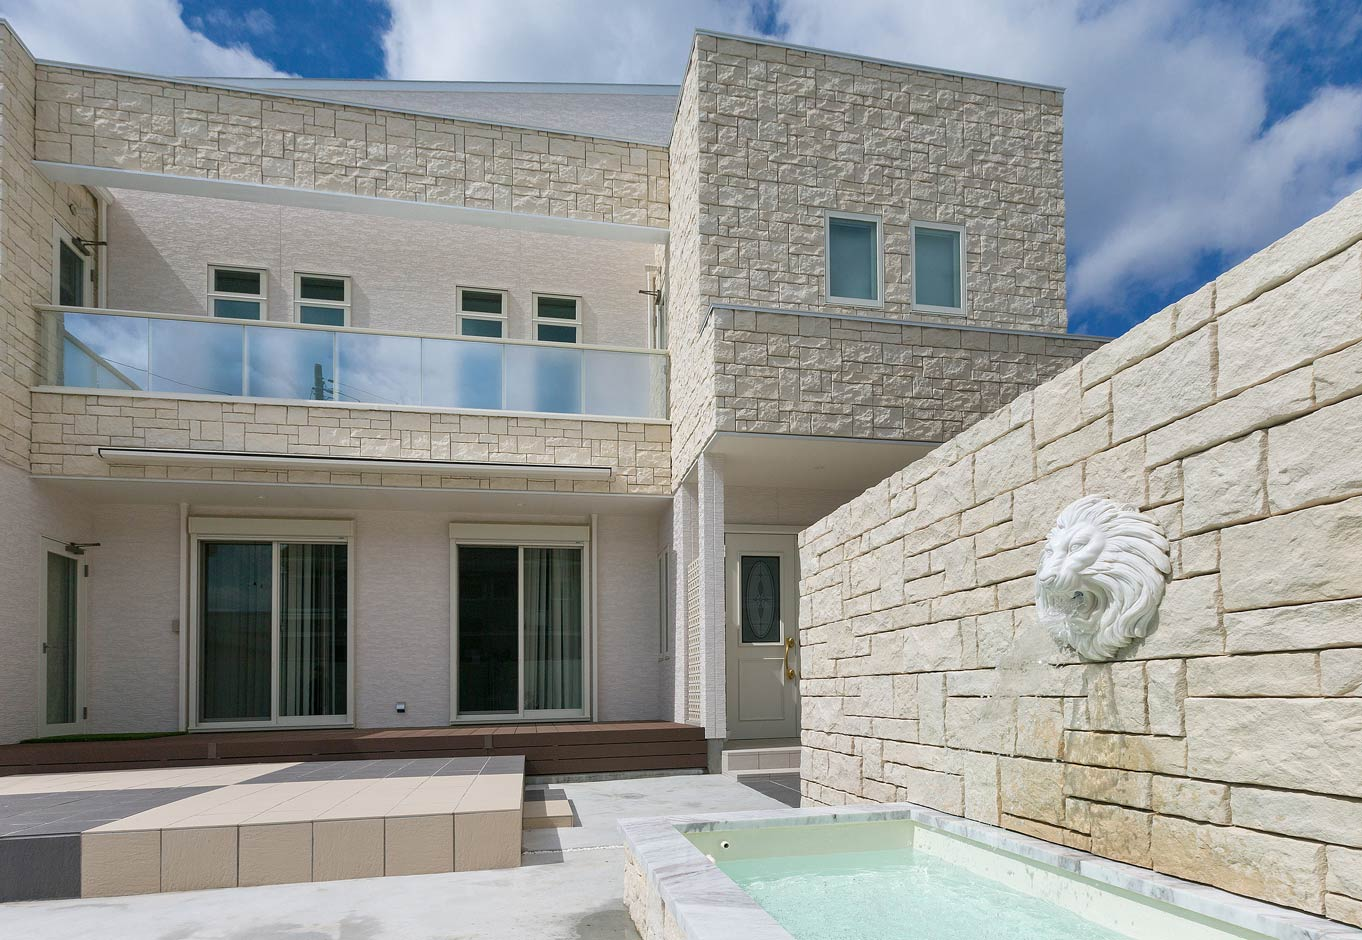 i.u.建築企画【デザイン住宅、建築家、インテリア】壁につけたライオンの口から水盤に水が流れ出る演出が個性的。ヨーロッパの庭園をイメージした中庭